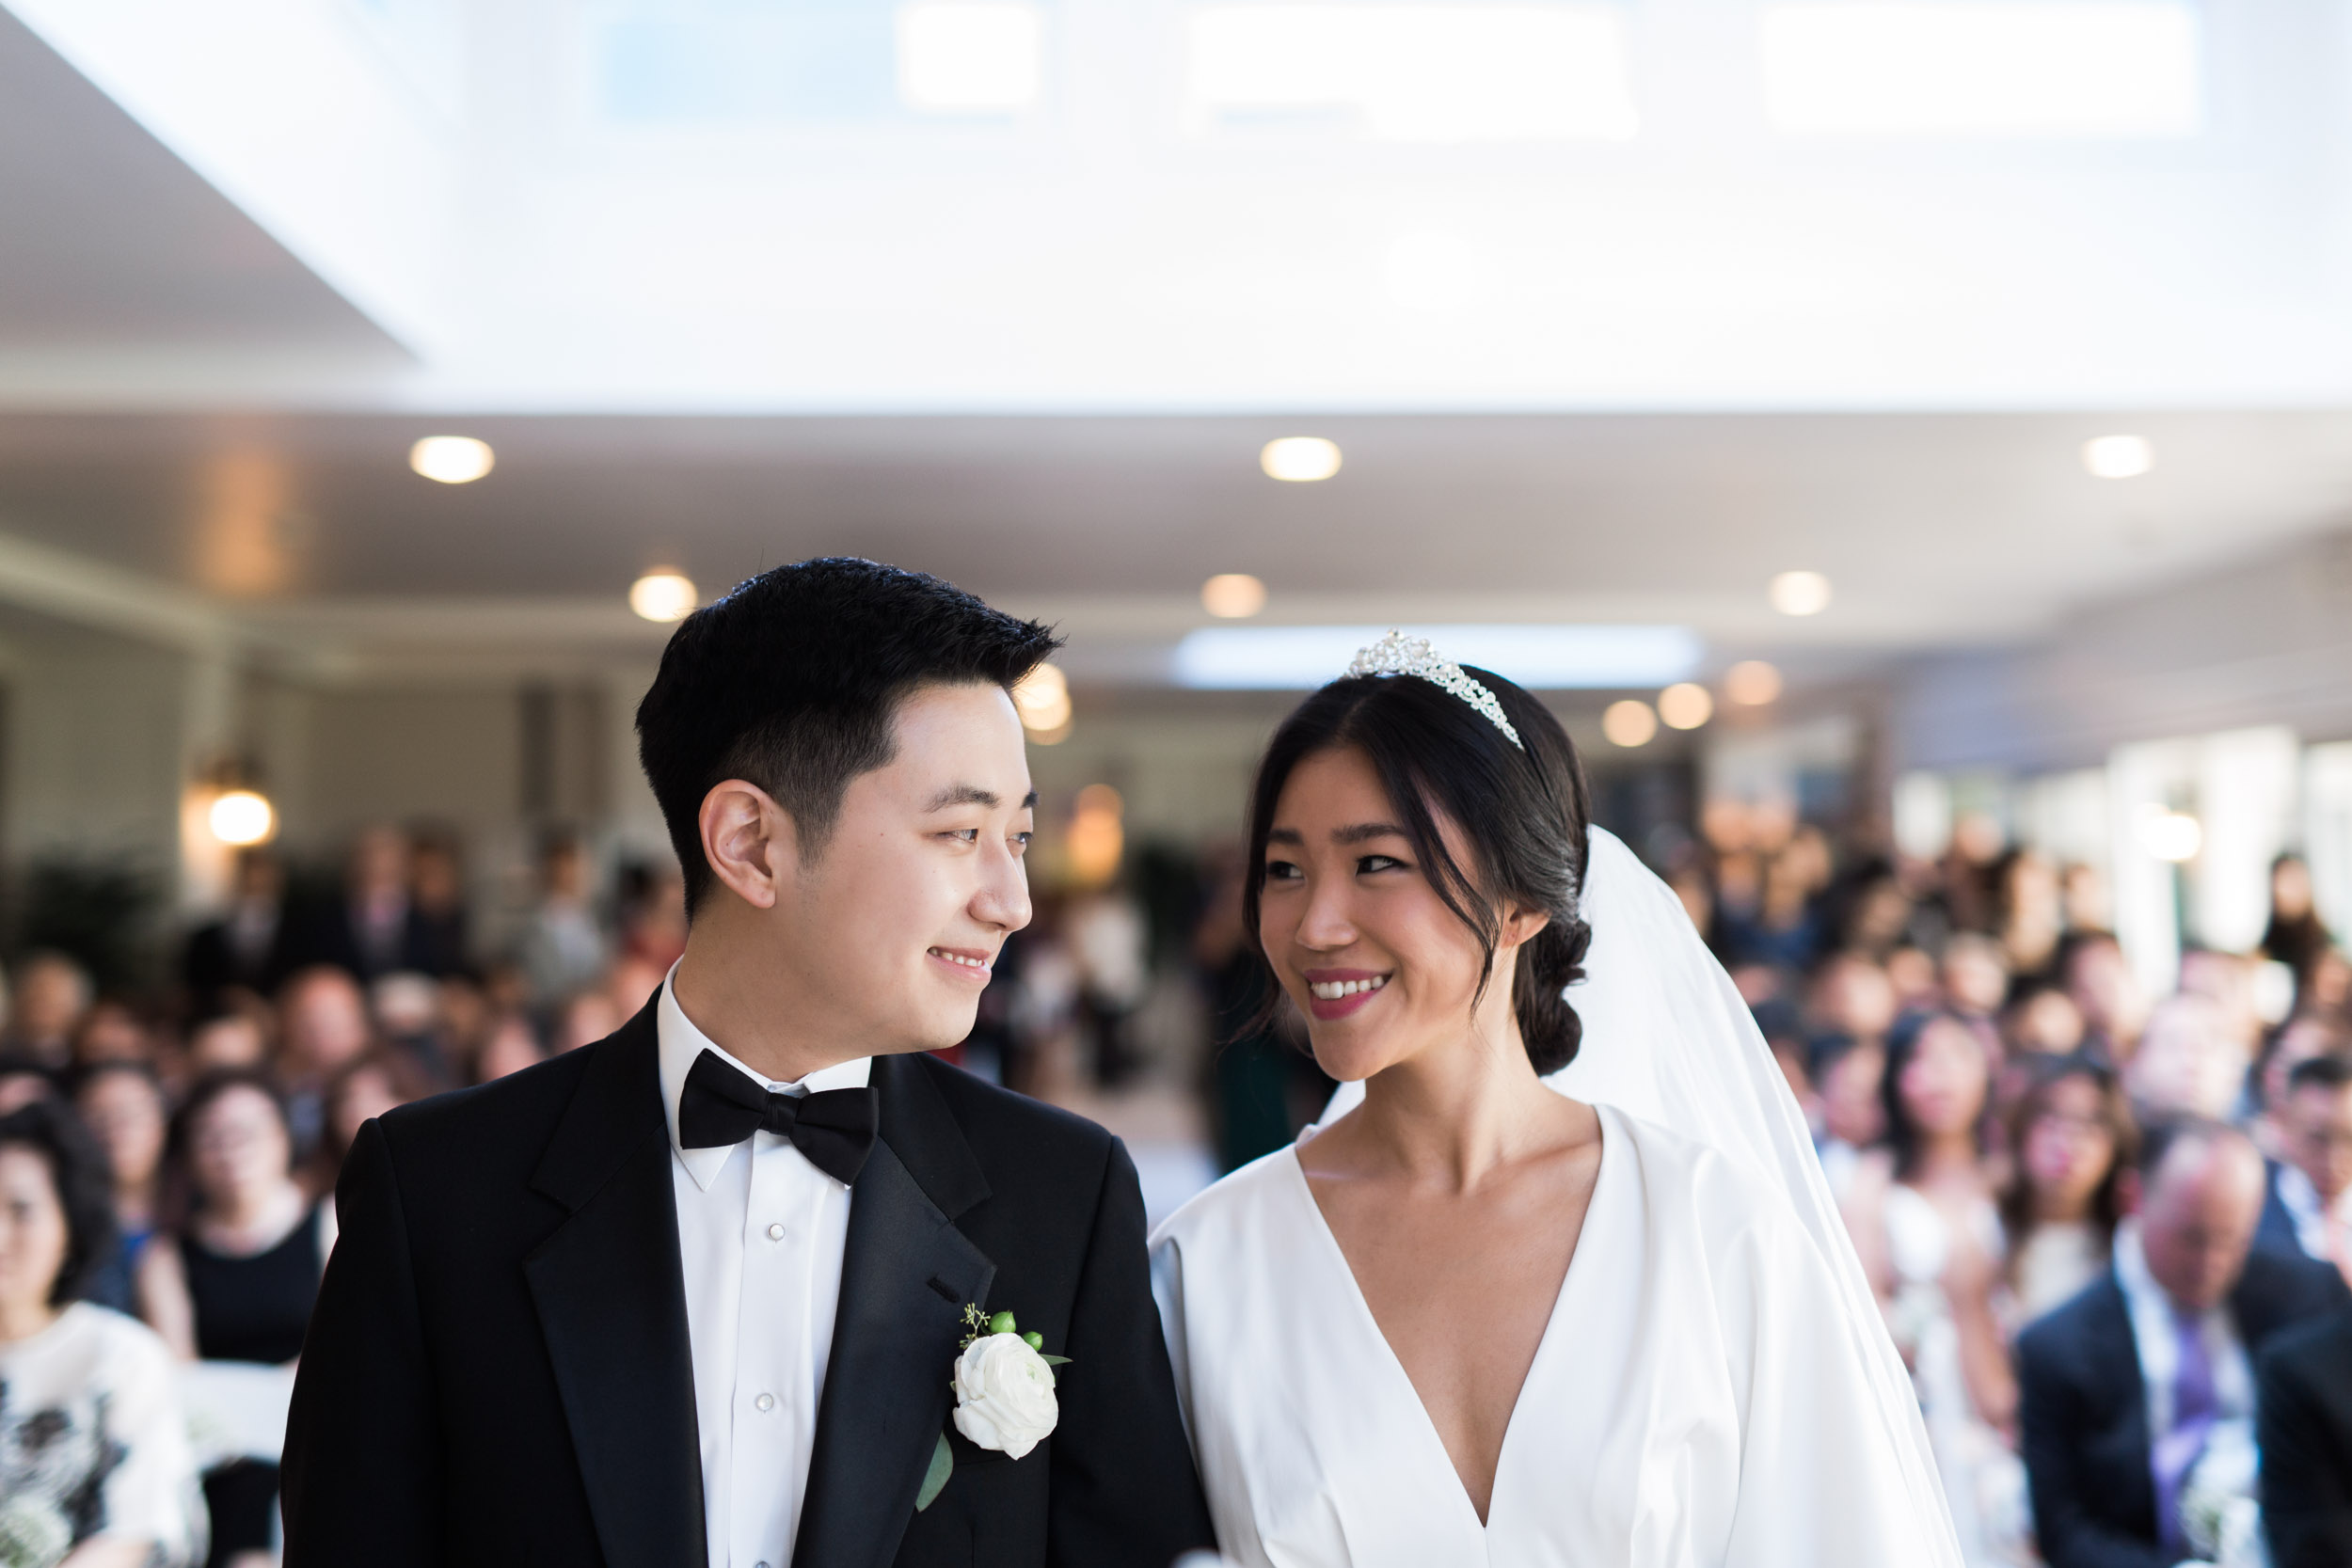 jean-arnold-wedding-0024.jpg